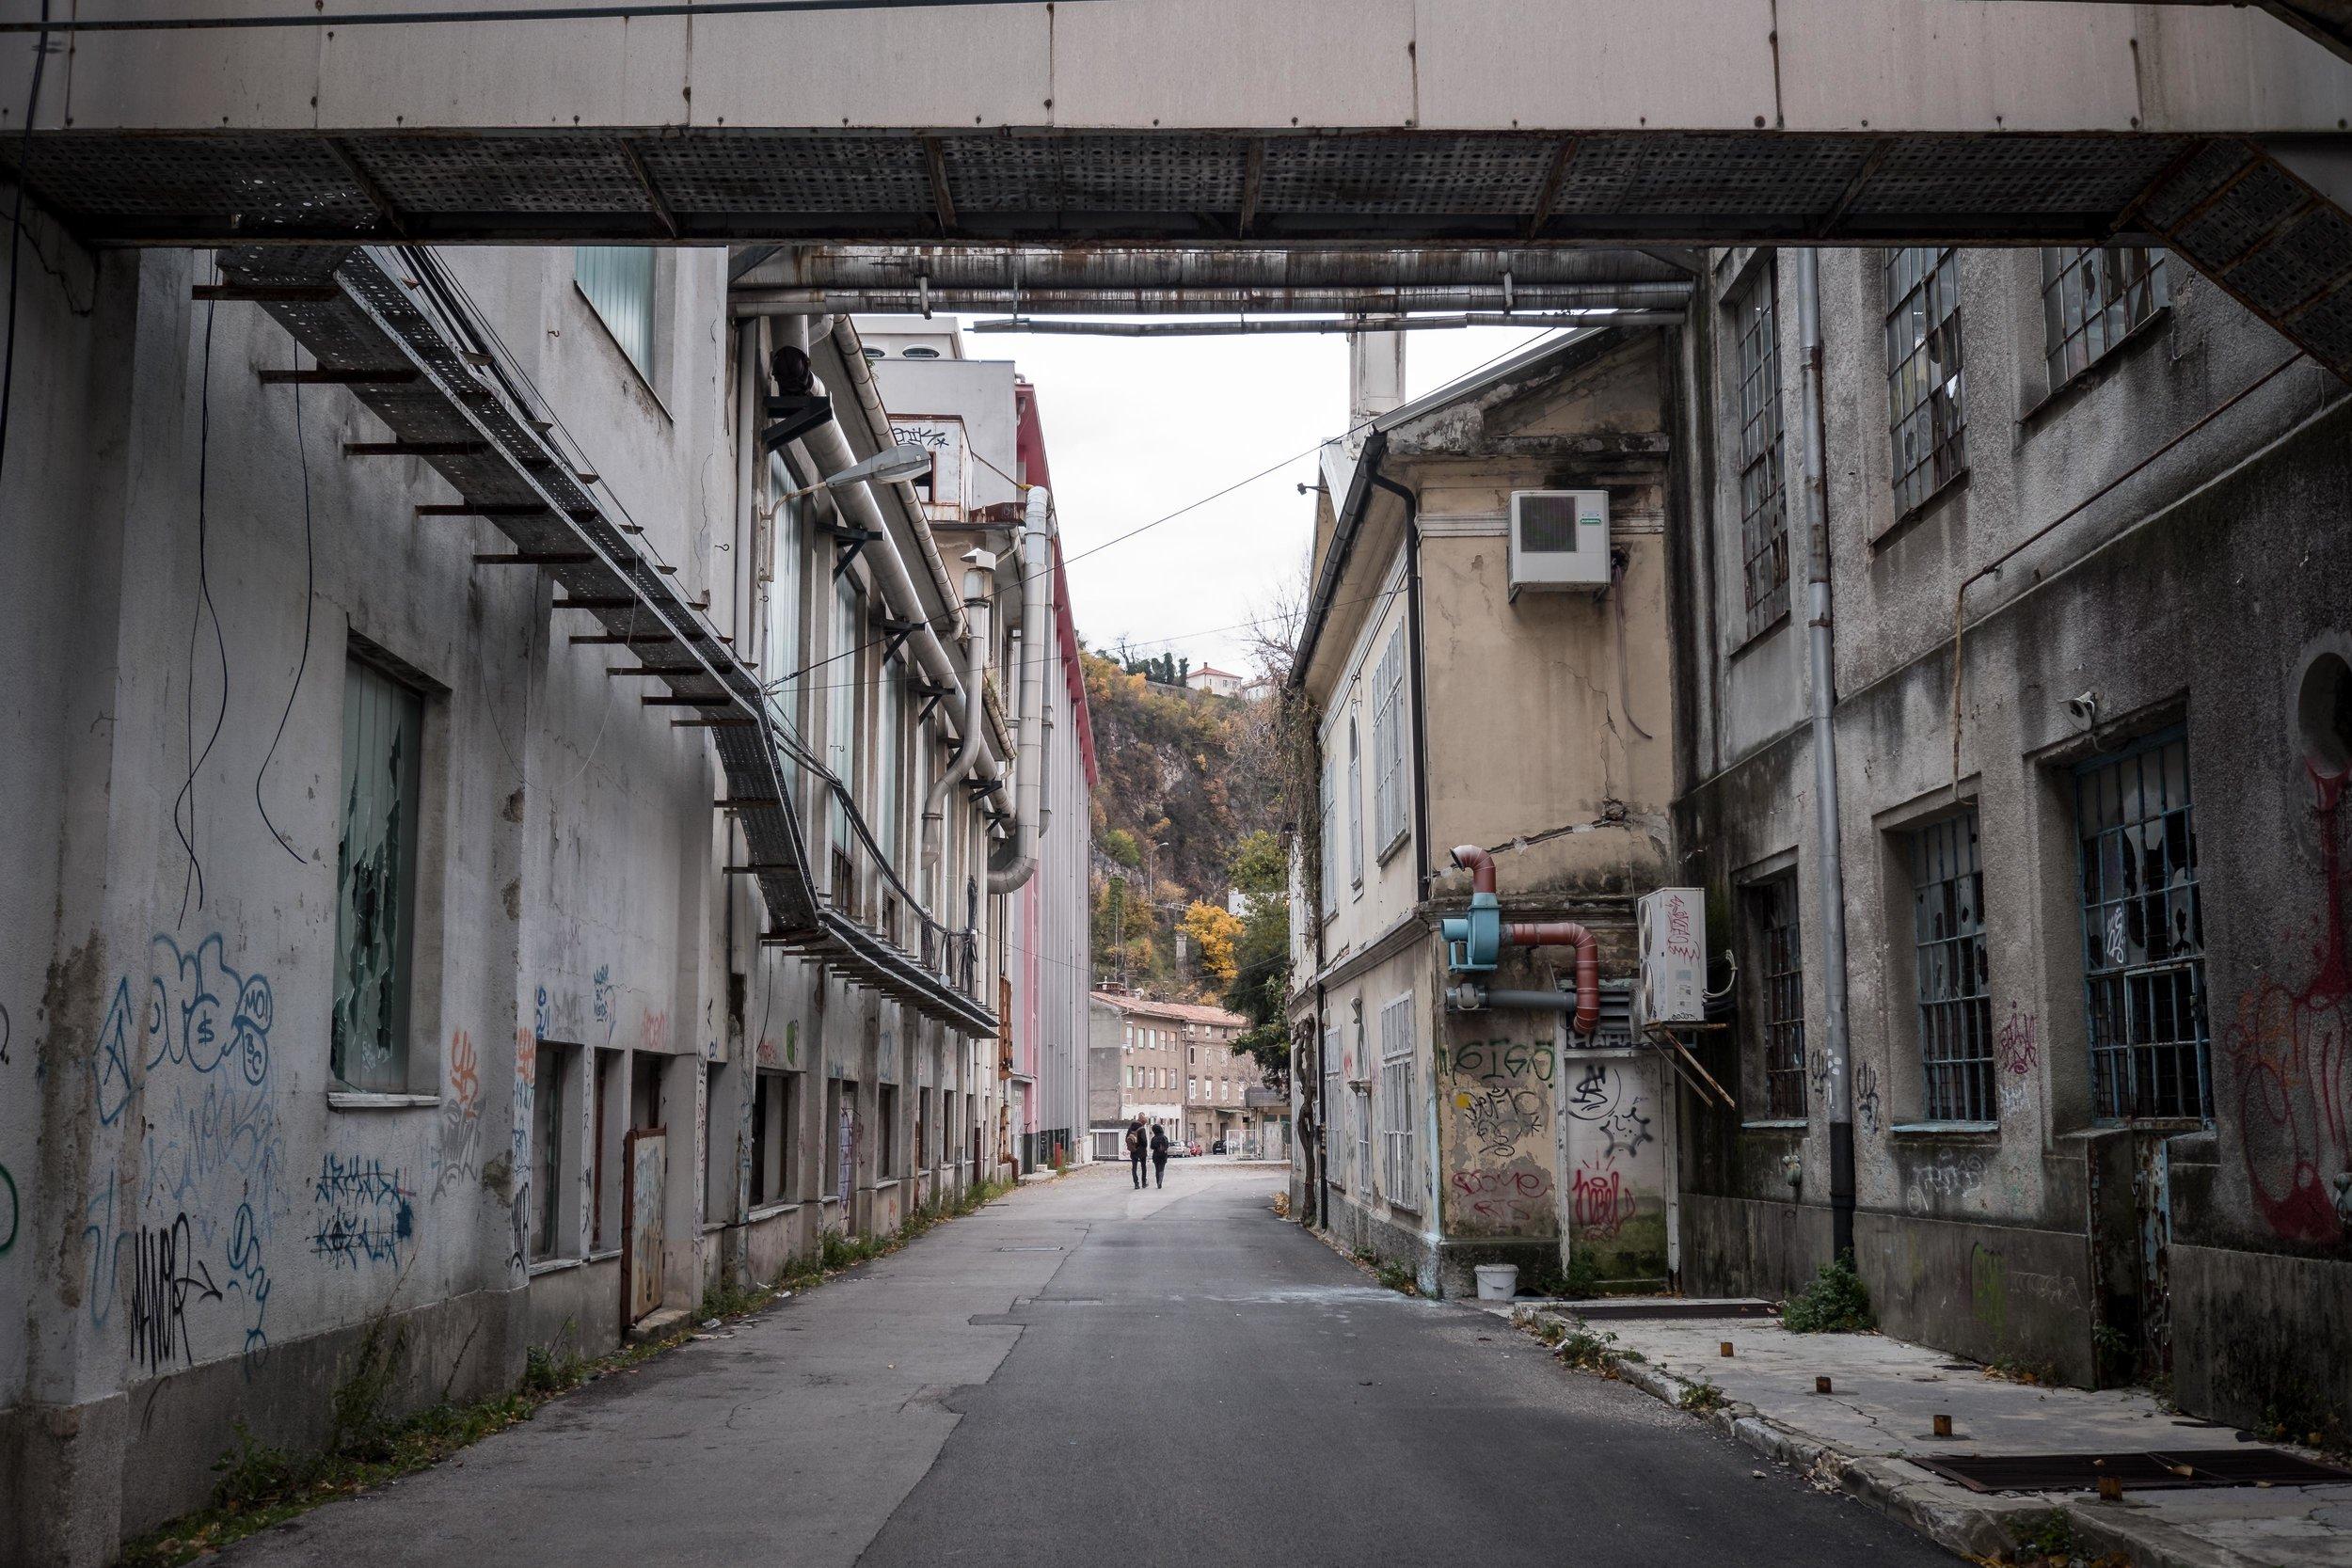 Rijeka industrial architecture4-8.jpg